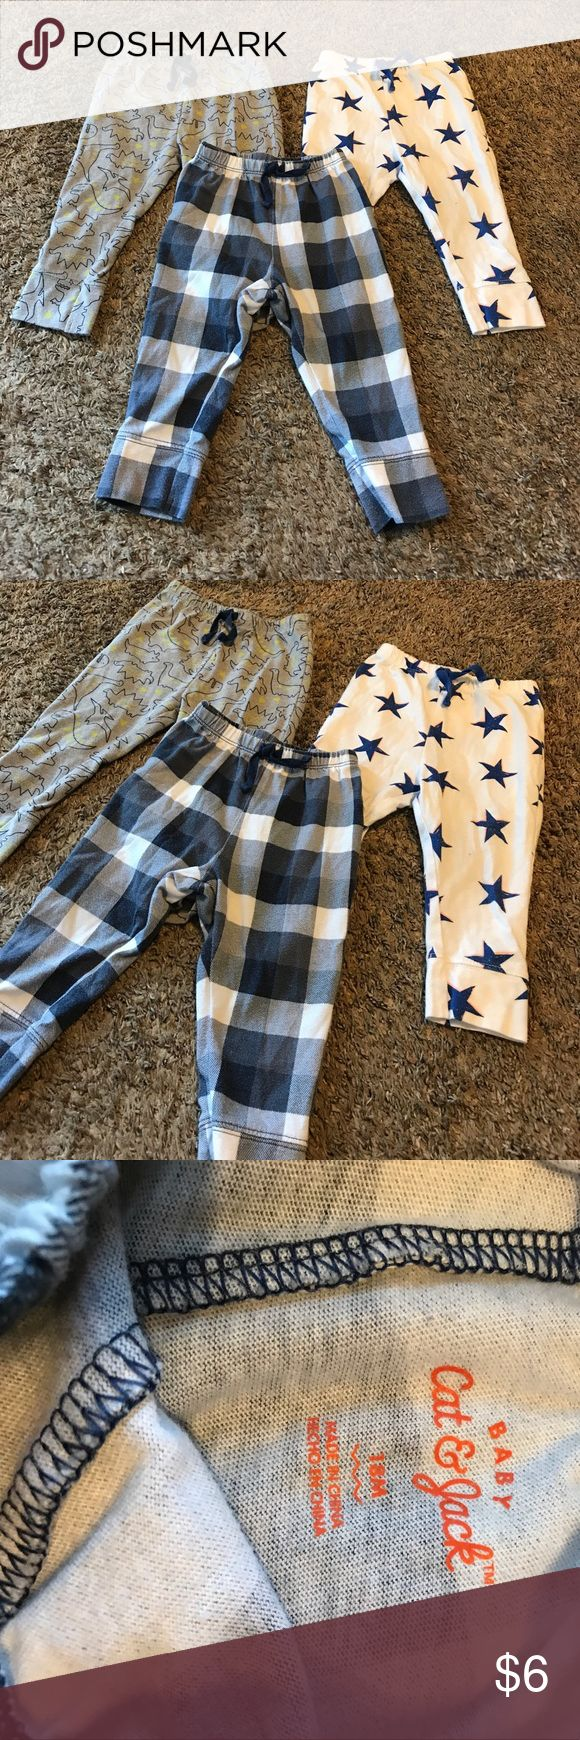 Baby boy pajama pants size 18 months Baby boy pajama pants size 18 months. Cat & Jack brand. 3 pairs. Cat & Jack Pajamas Pajama Bottoms